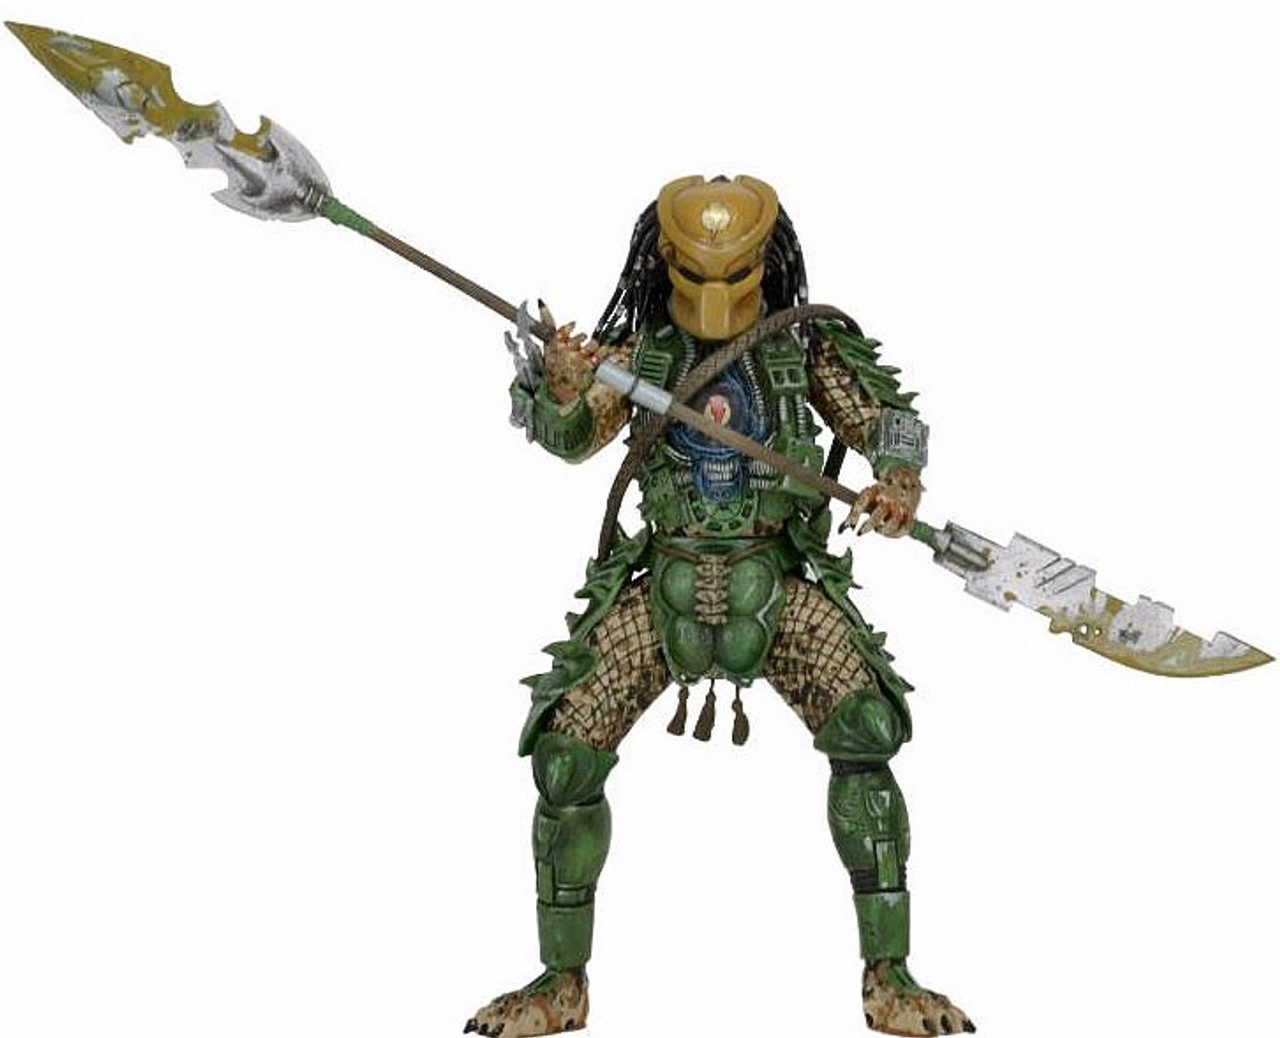 NECA PREDATOR série 18 Broken Tusk Predator Action Figure NEW